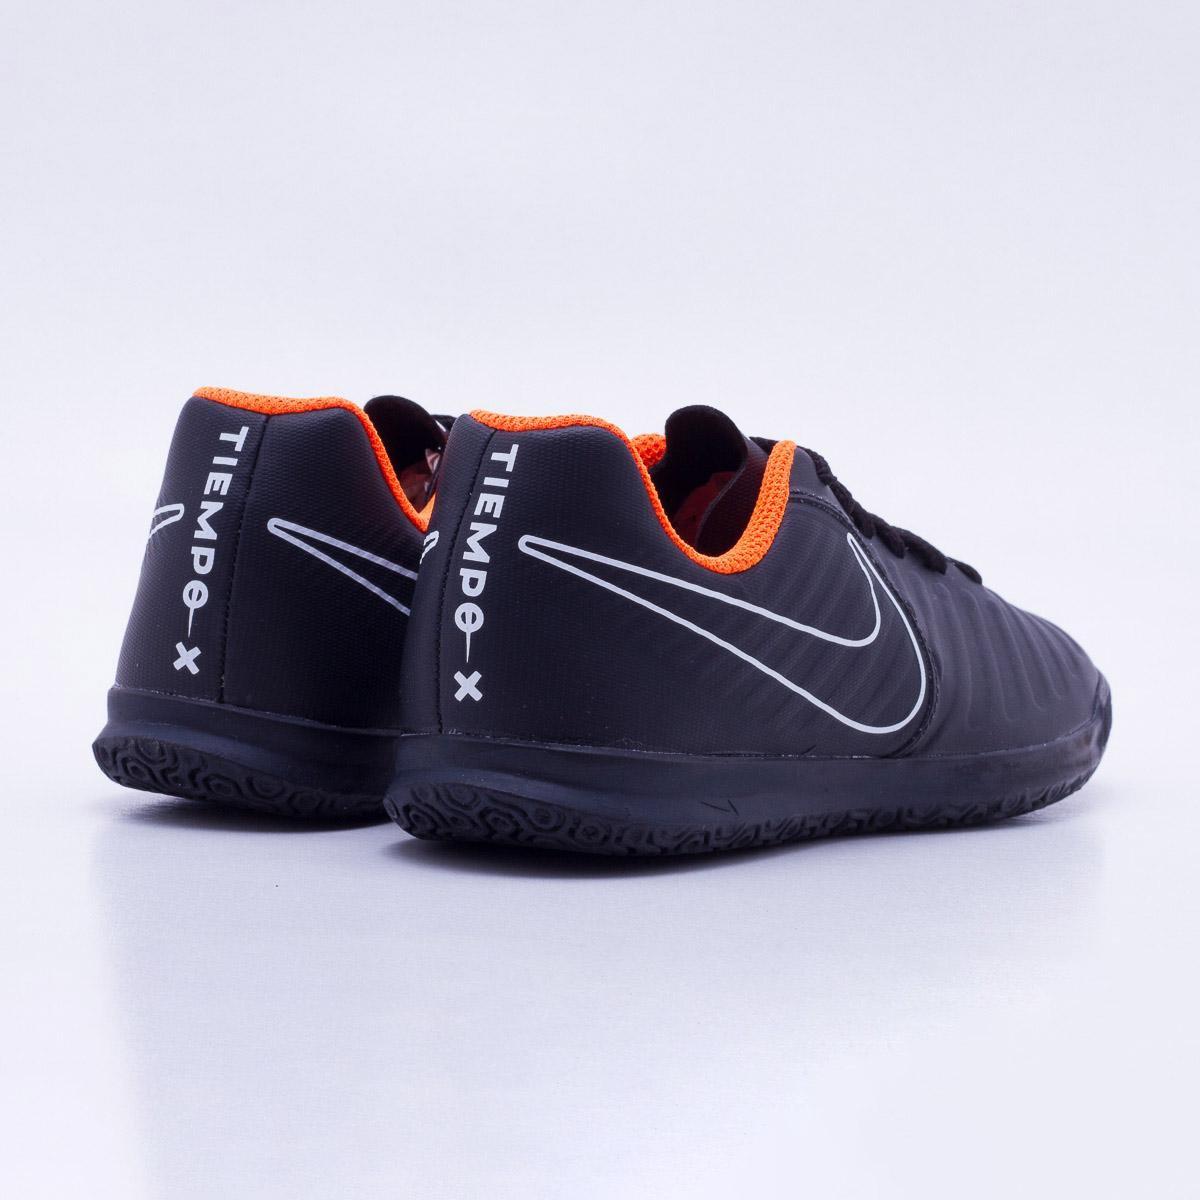 cda629253d Chuteira Futsal Infantil Nike Tiempo Legend 7 Club IC - Preto e ...